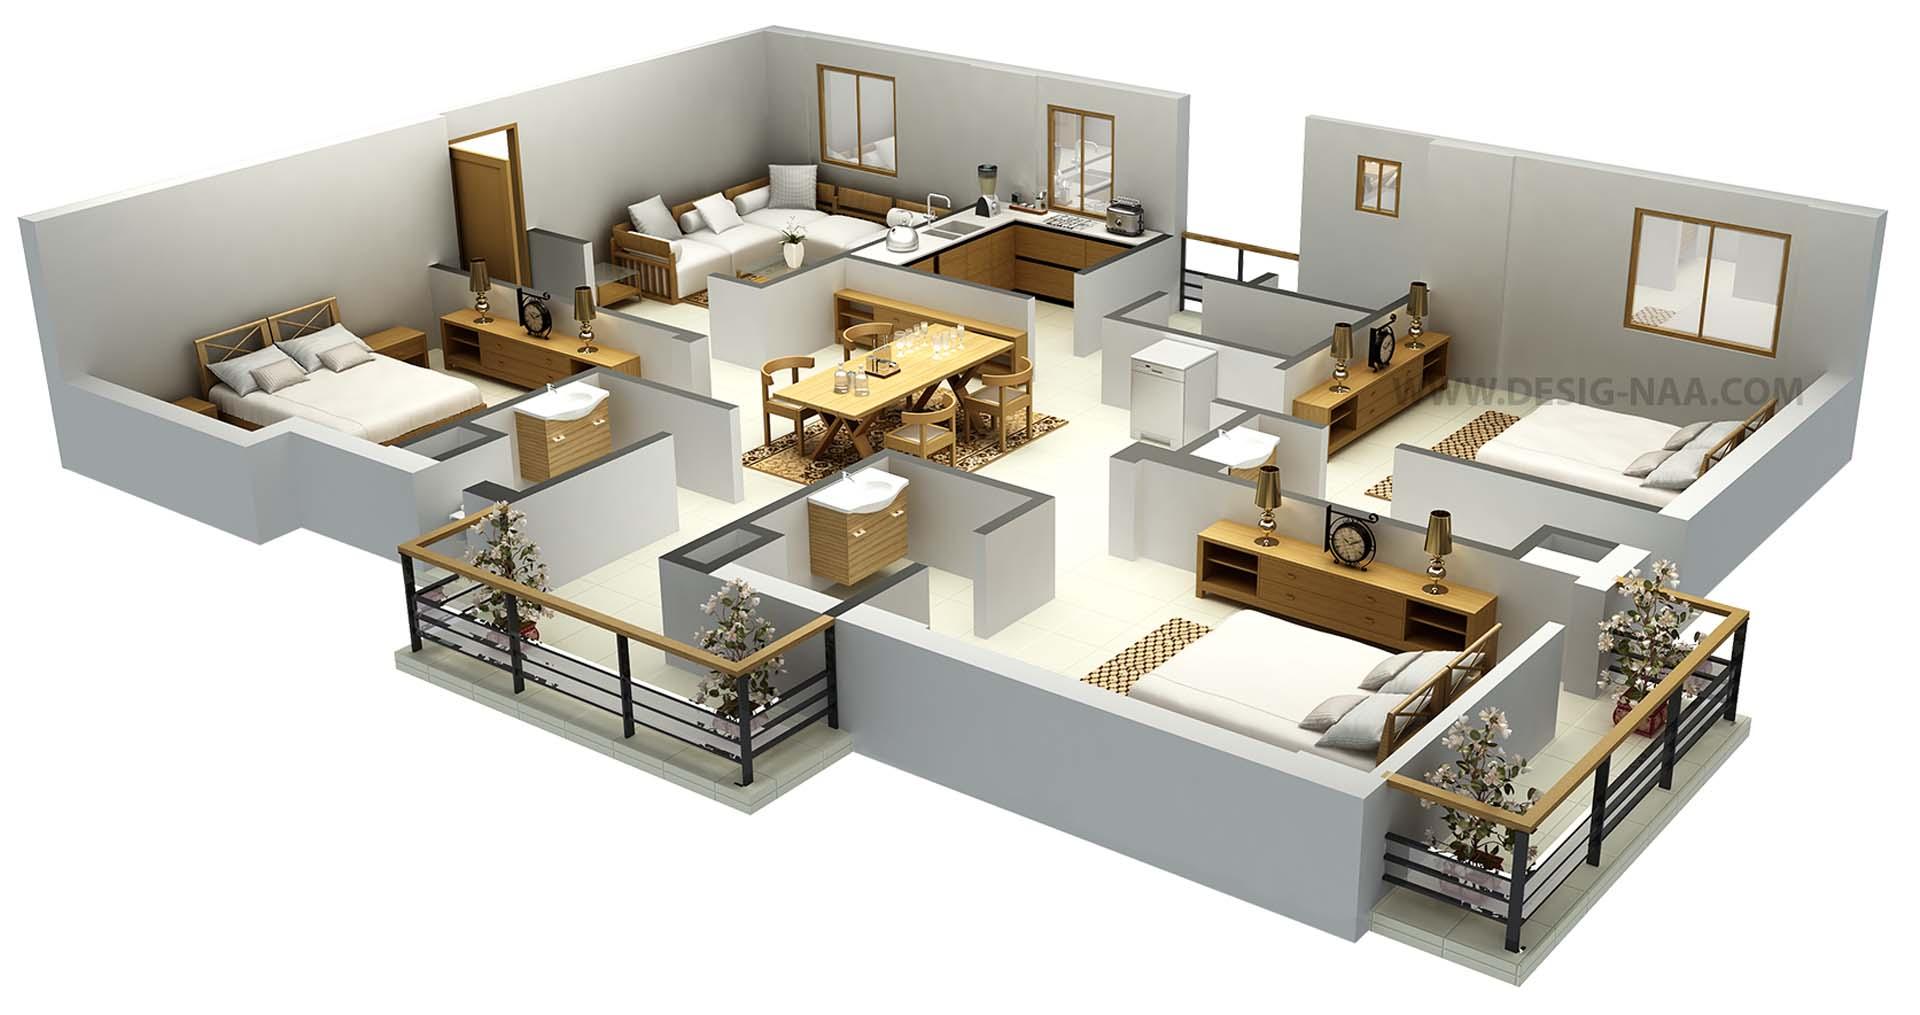 Floor Plan 3d Model Free Download картинки и фотографии